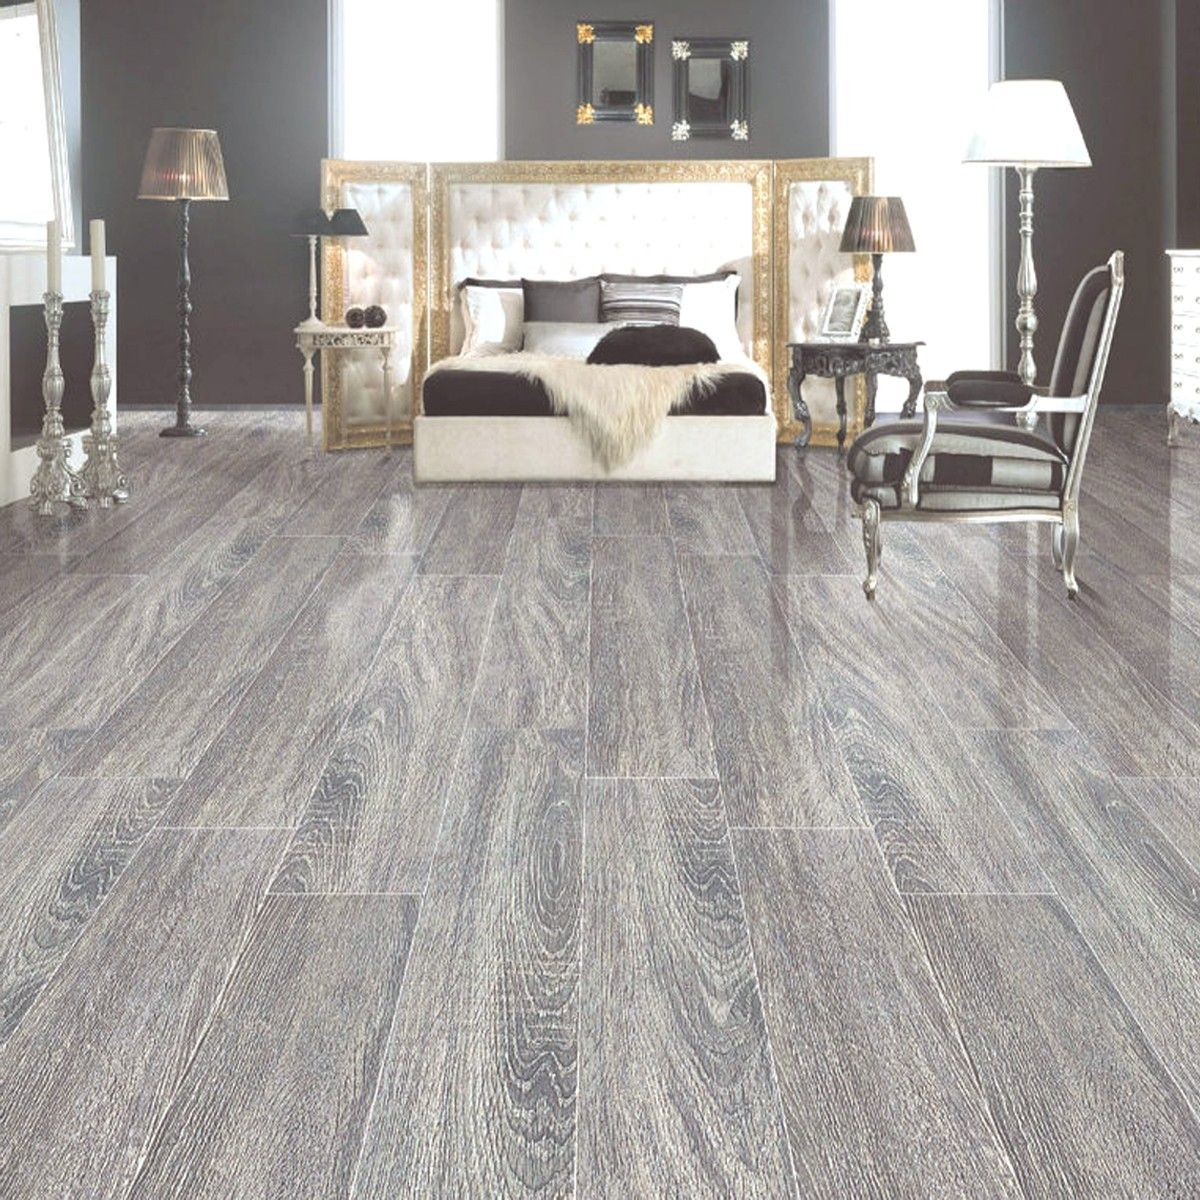 95x24 petula gris floor tiles tile choice floors pinterest wood grain tile good looking china gray ceramic tile wood grain in dailygadgetfo Images